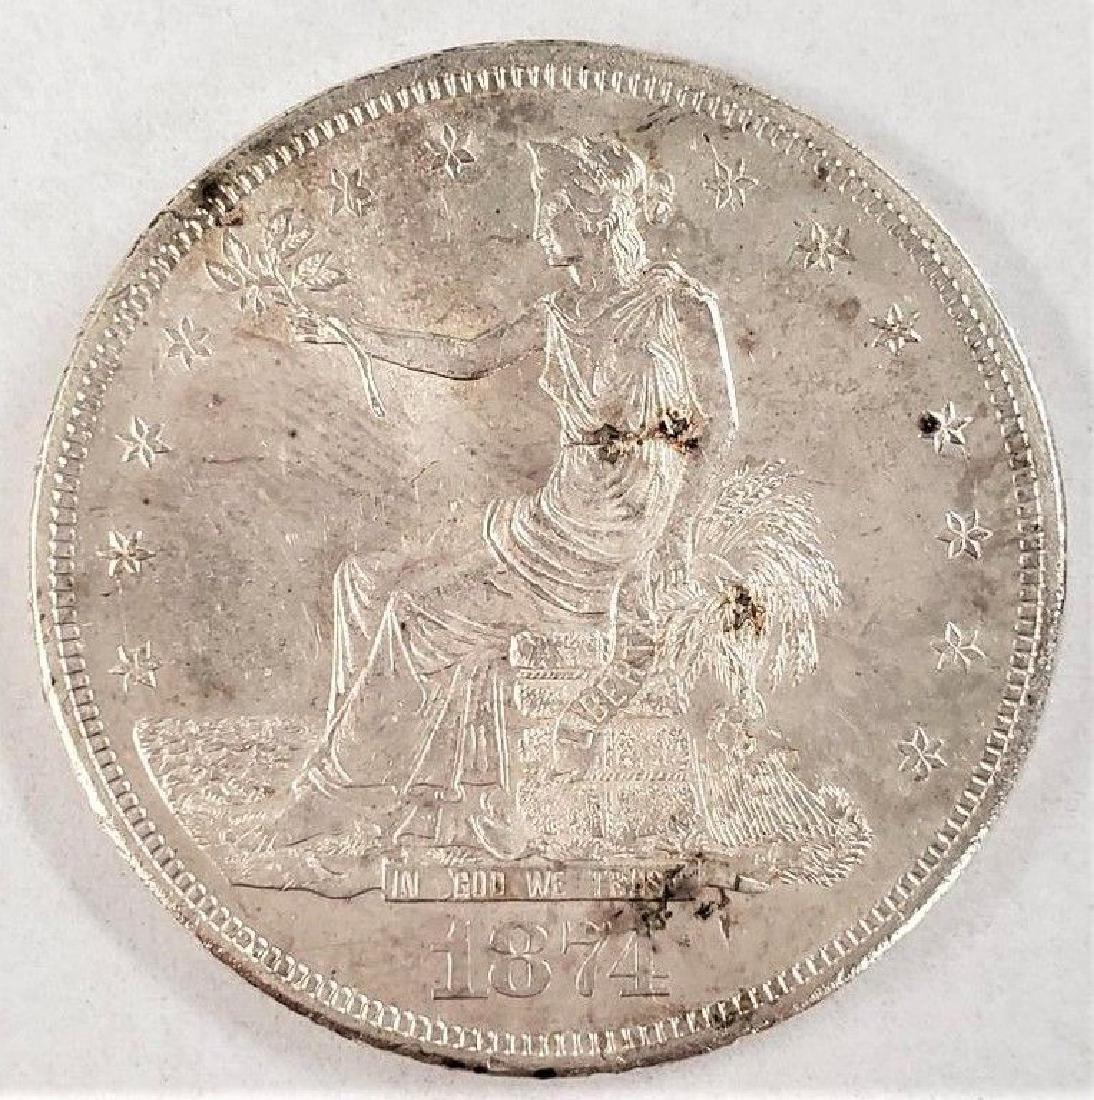 BARGAIN HUNTER SILVER DOLLARS AND GOLD!